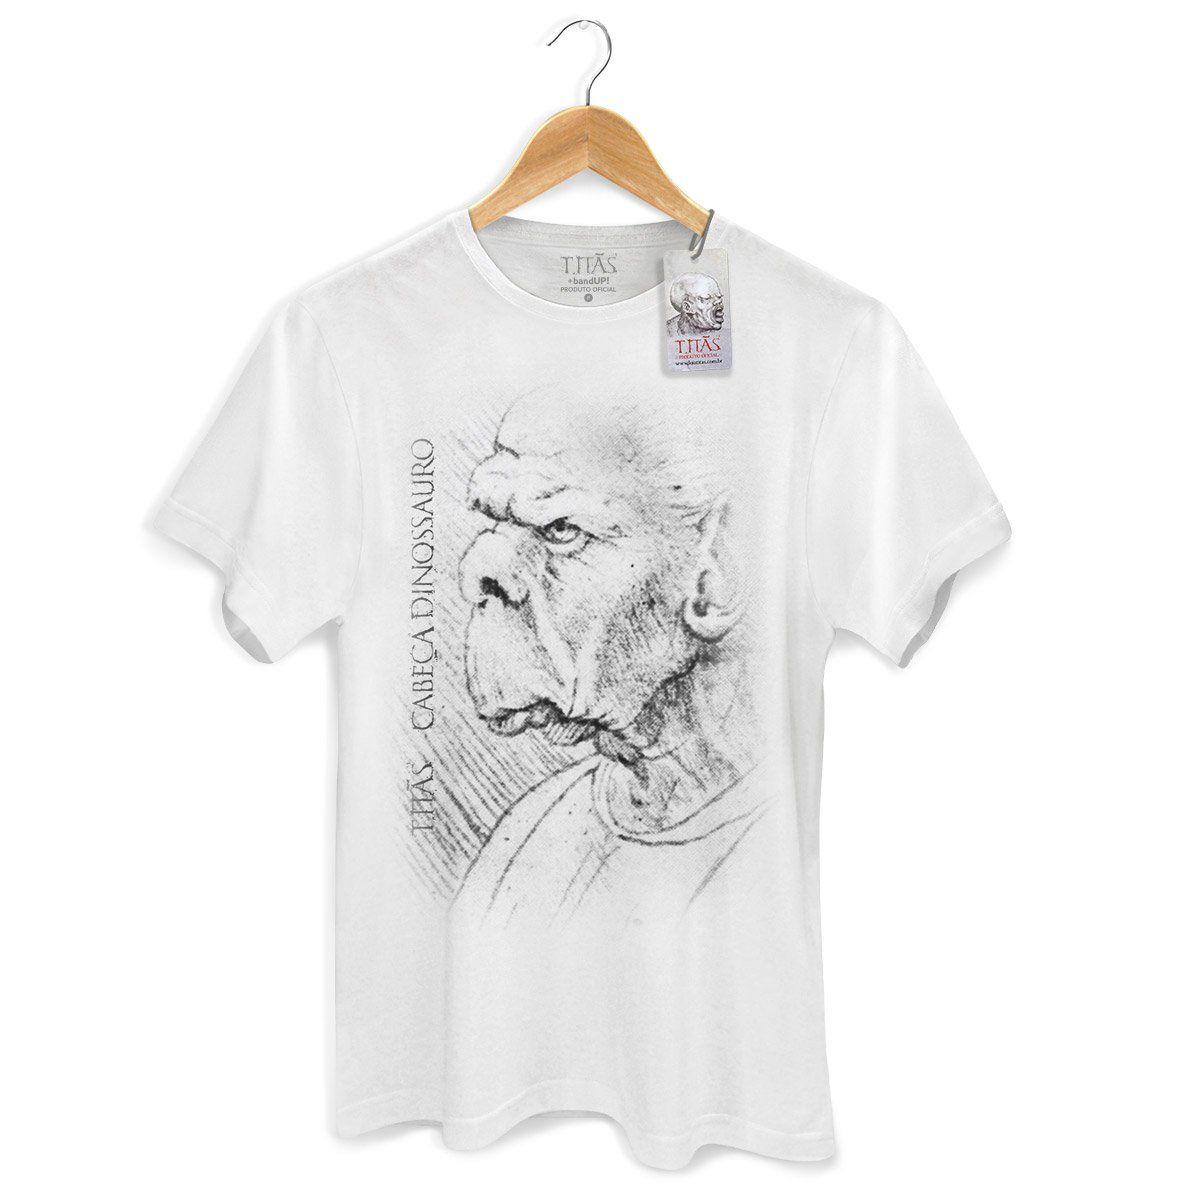 Camiseta Masculina Titãs Cabeça Dinossauro 2  - bandUP Store Marketplace